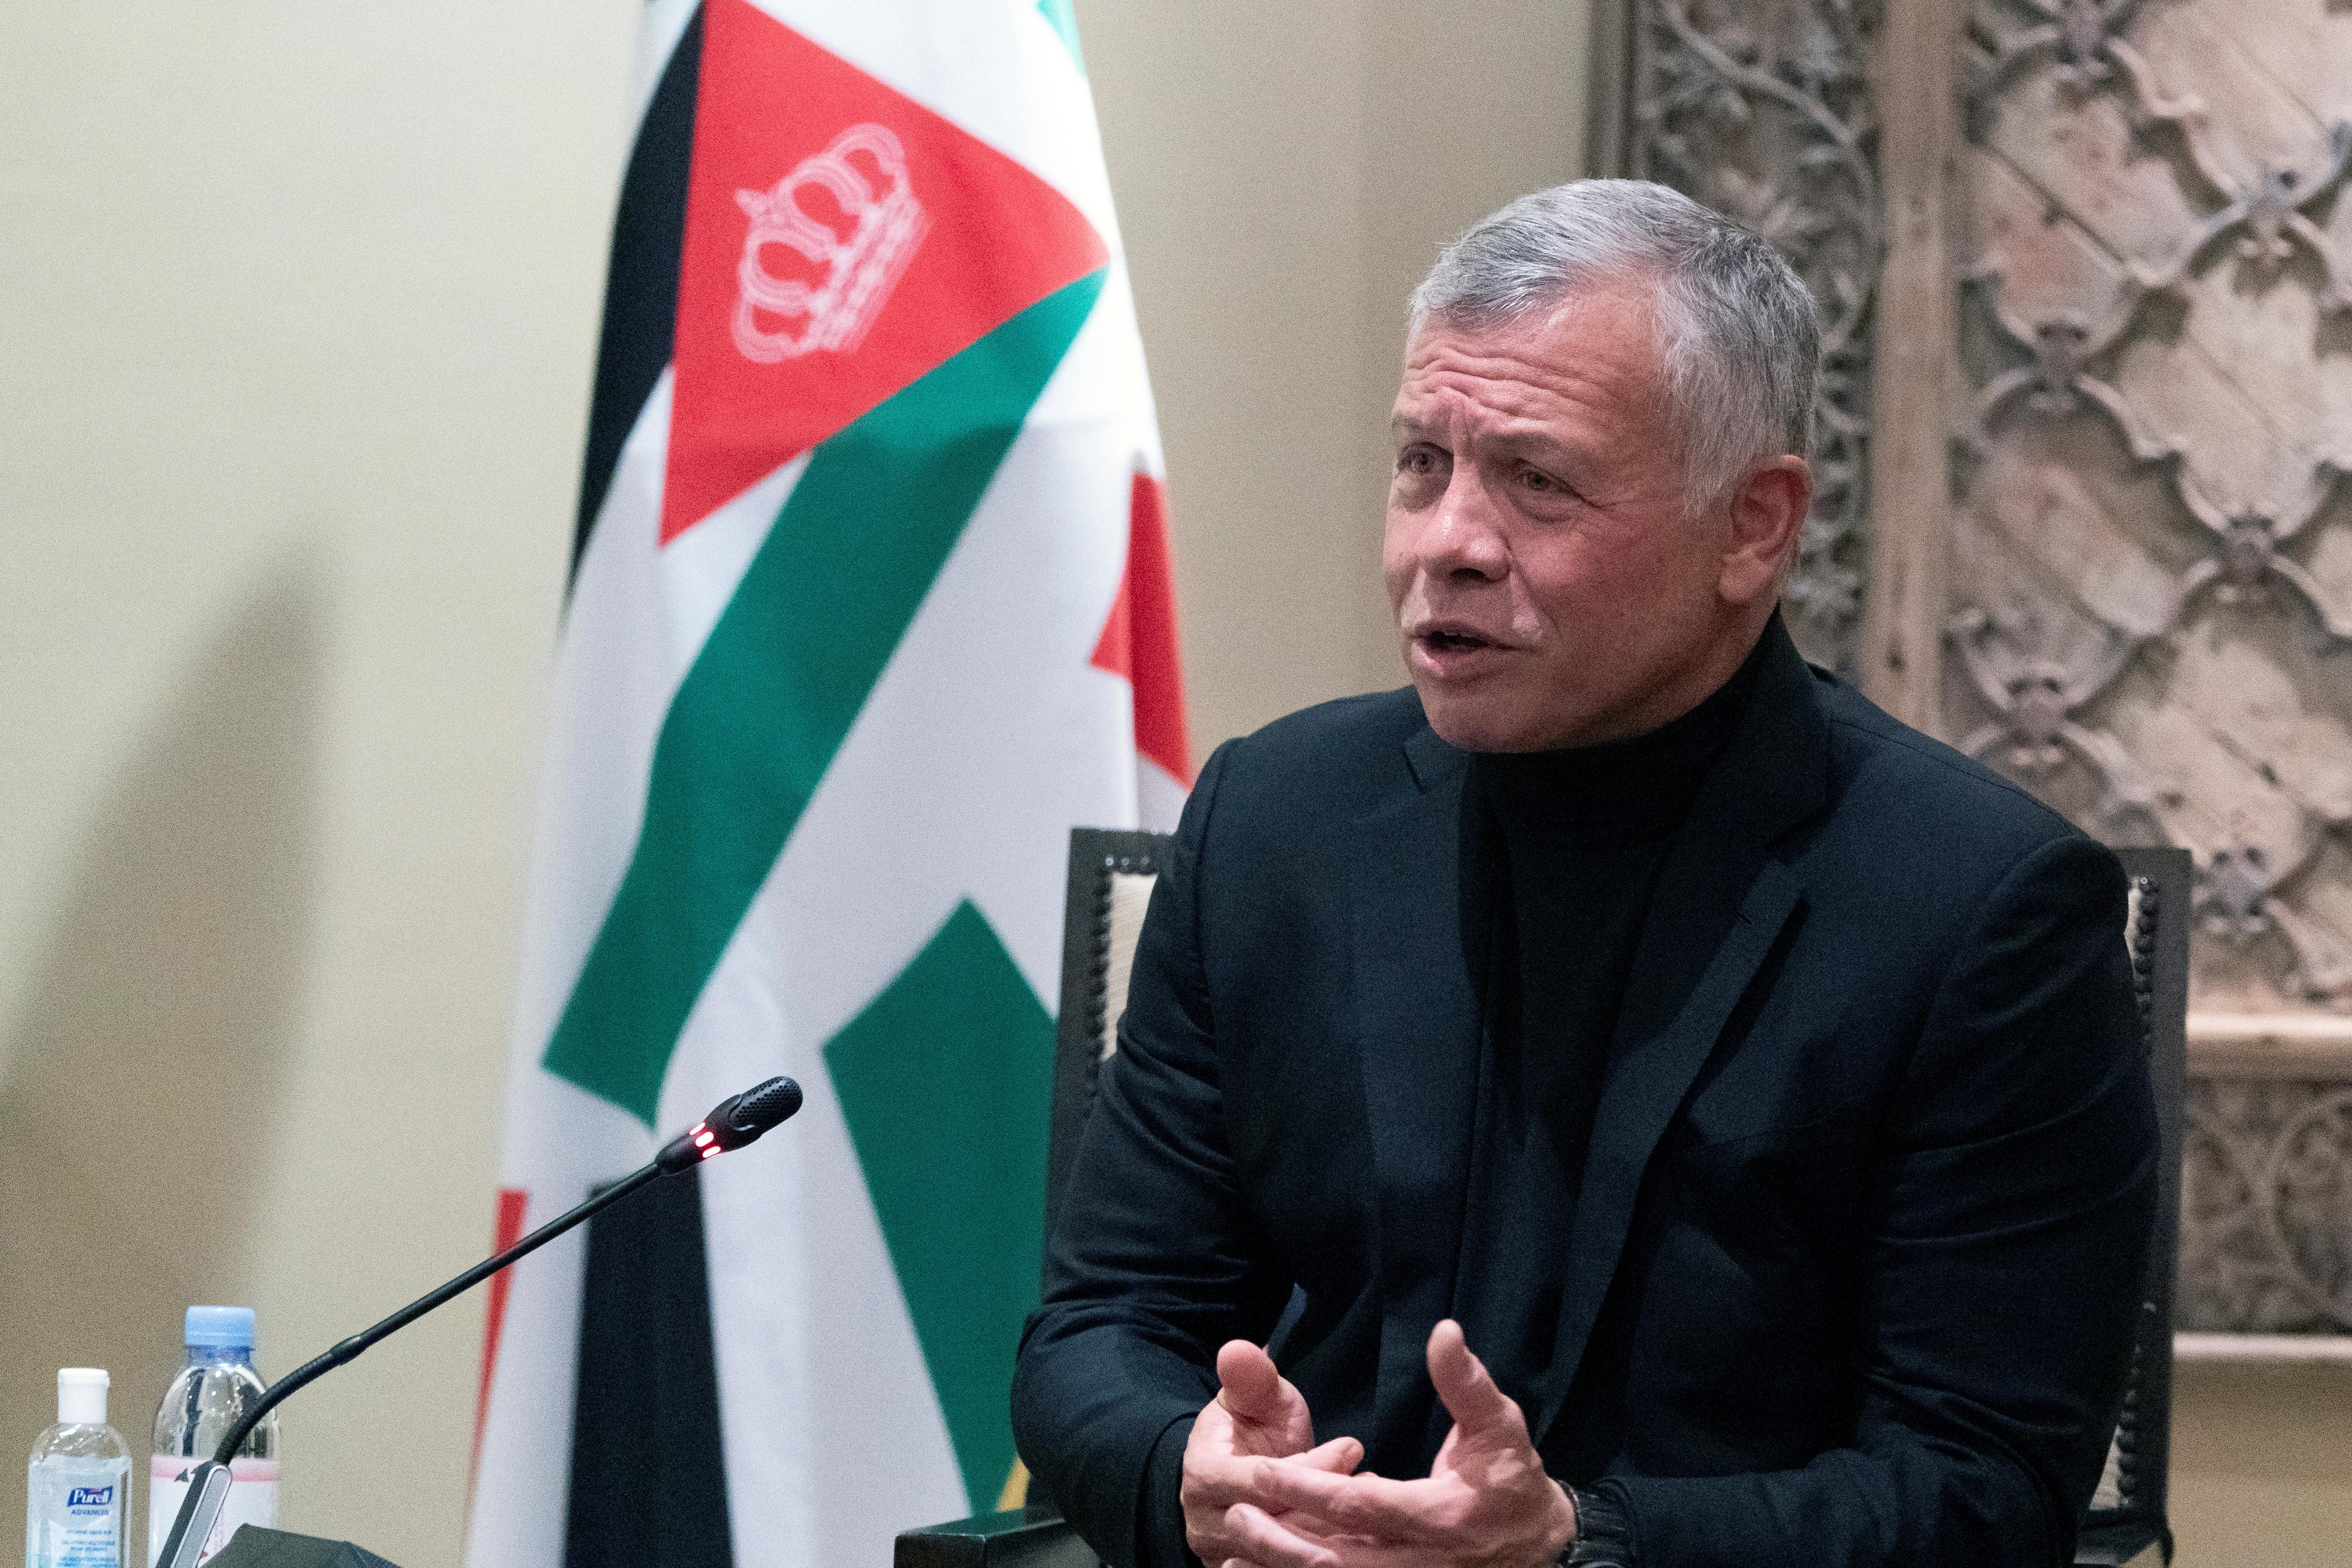 Jordan's King Abdullah II speaks during a meeting with Secretary of State Antony Blinken at Bayt Al Urdon, in Amman, Jordan May 26, 2021. Alex Brandon/Pool via REUTERS